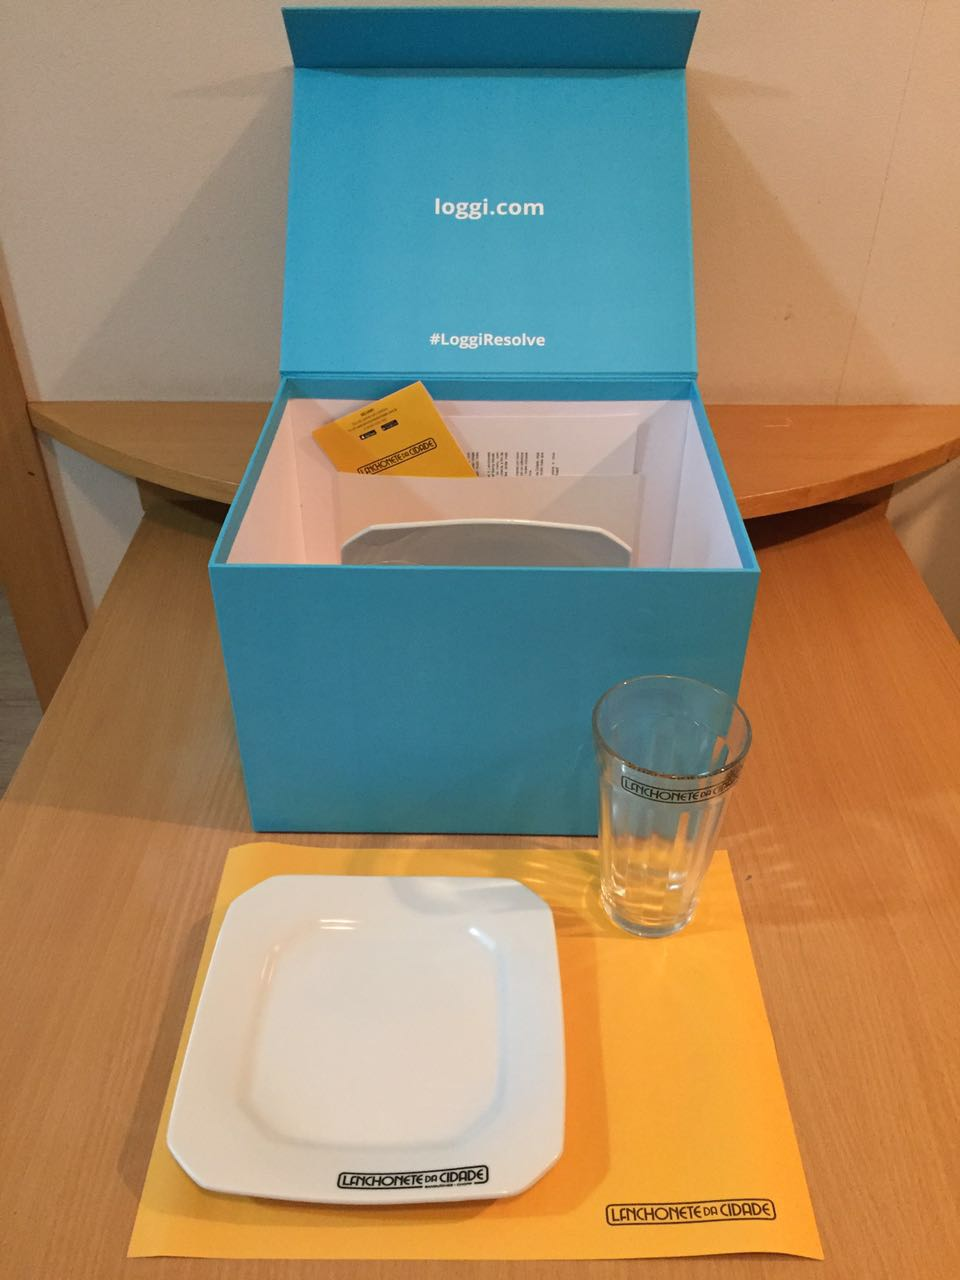 loggi press kit (2)